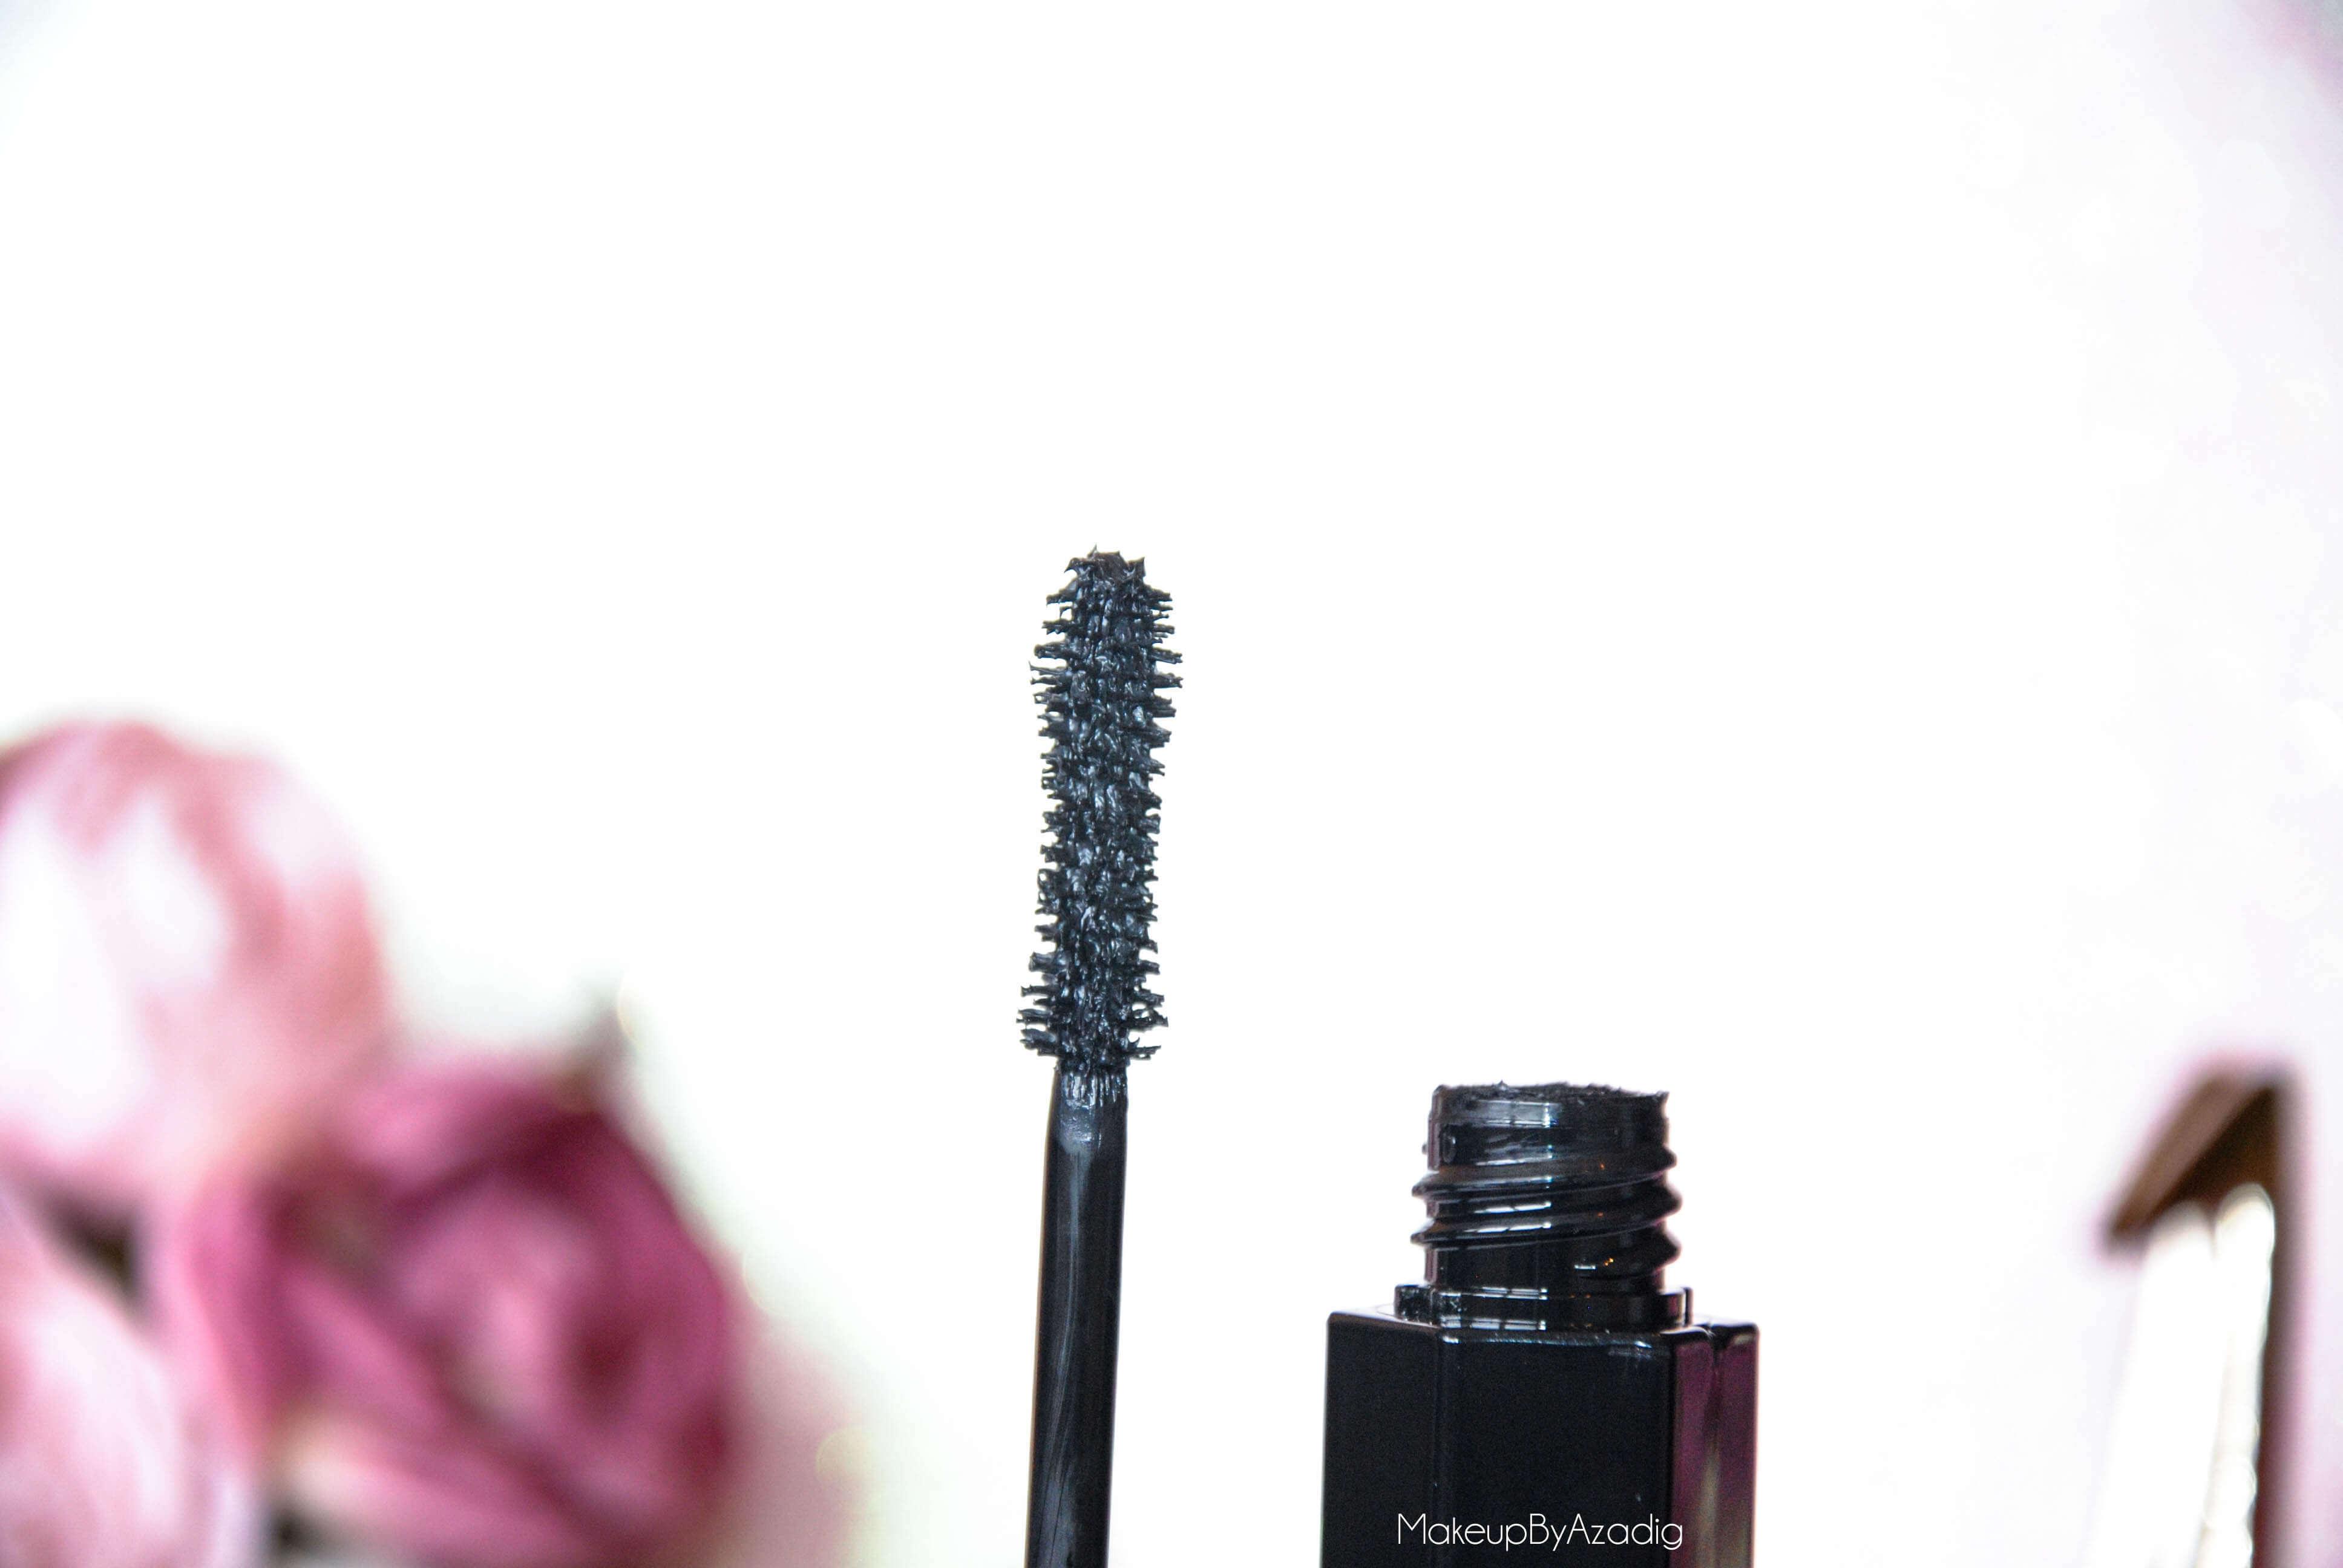 velvet noir-volume spectaculaire-marc jacobs-makeupbyazadig-revue-review-mascara-noir intense-brosse